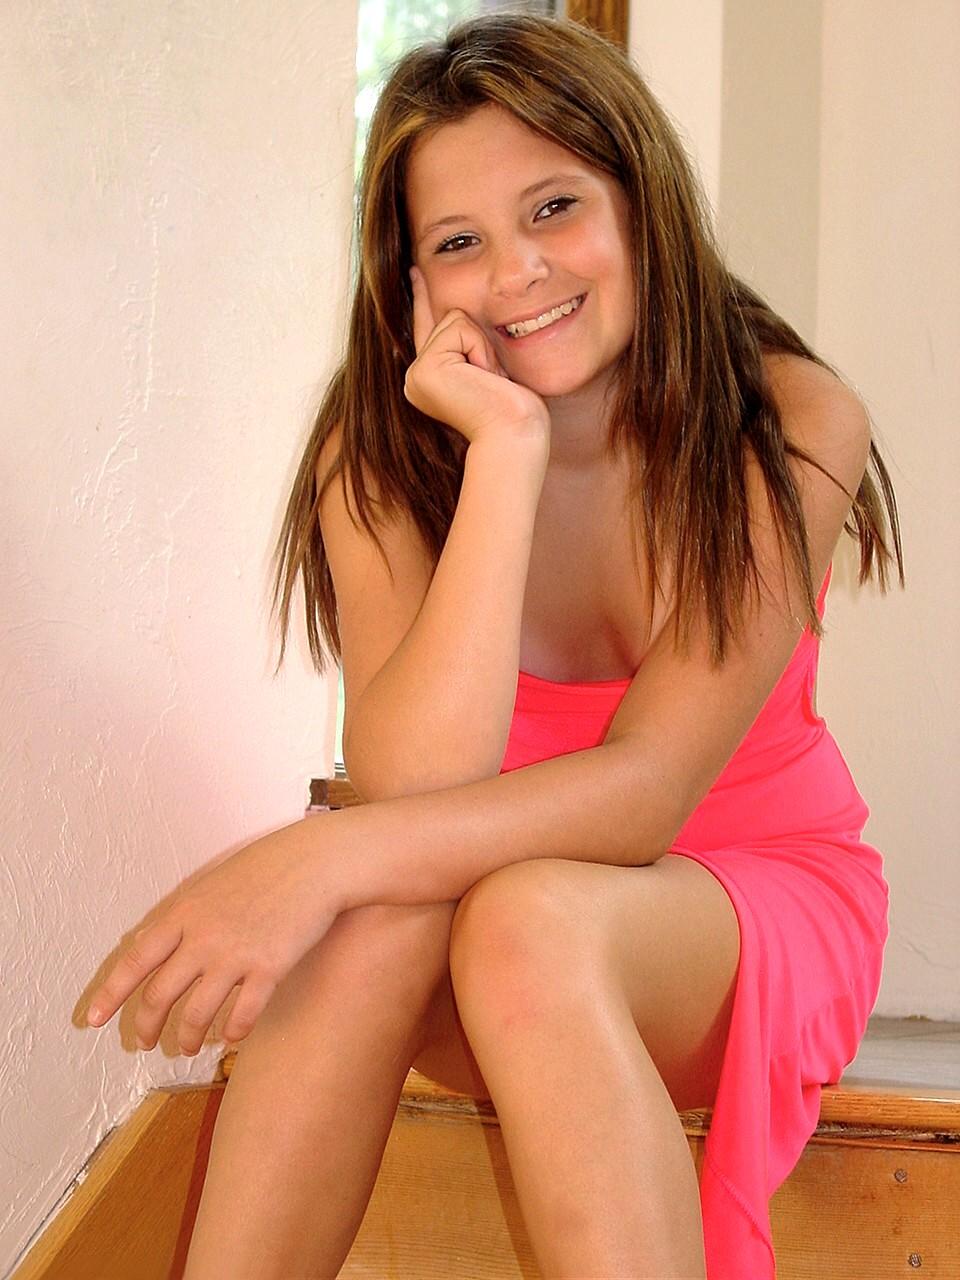 Haley teen model pink dress